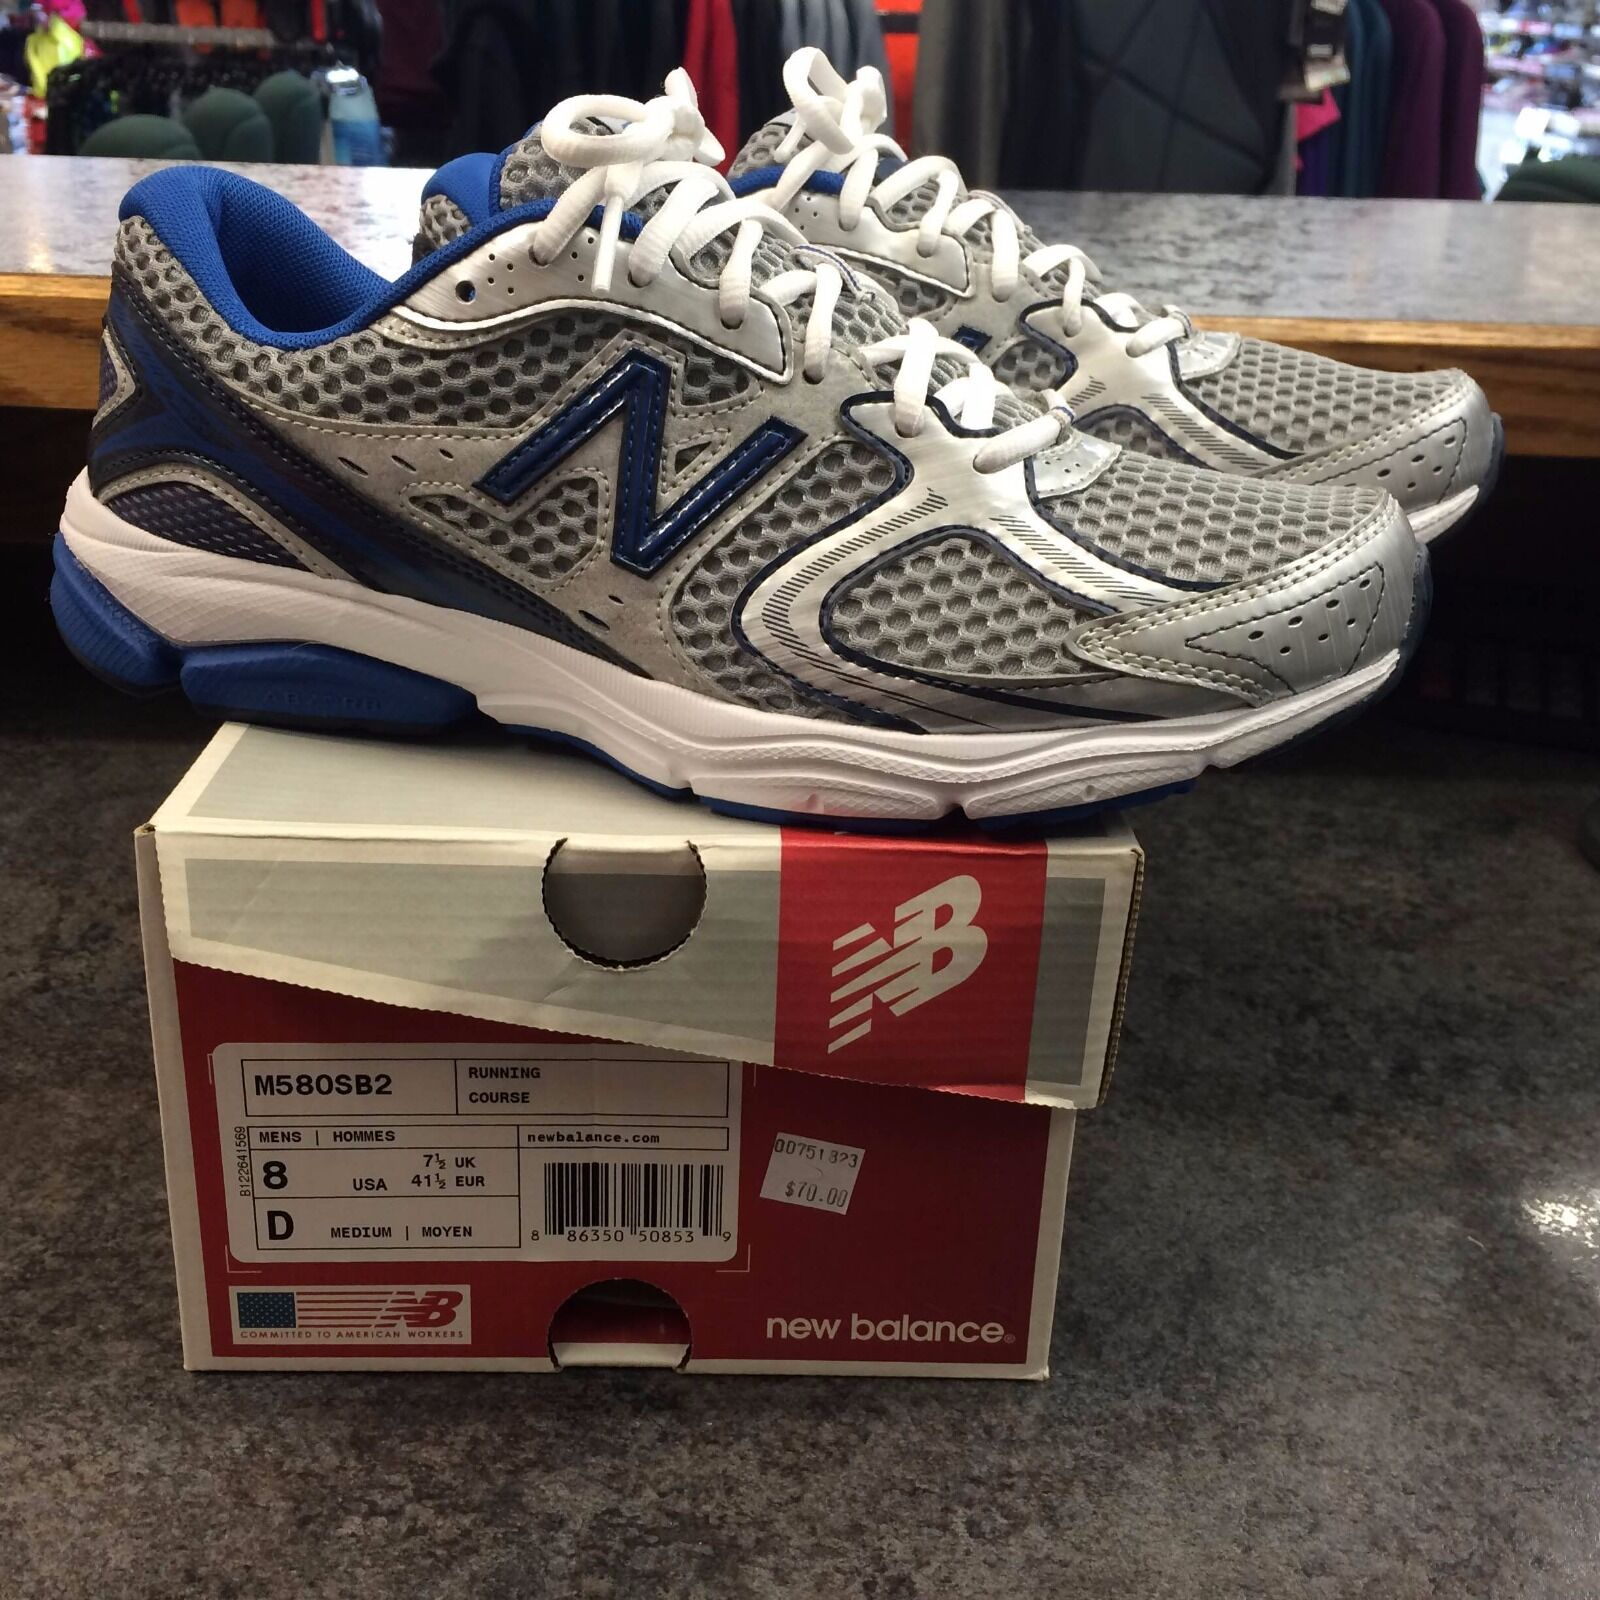 Men's size 8 New Balance M580SB2 running shoe